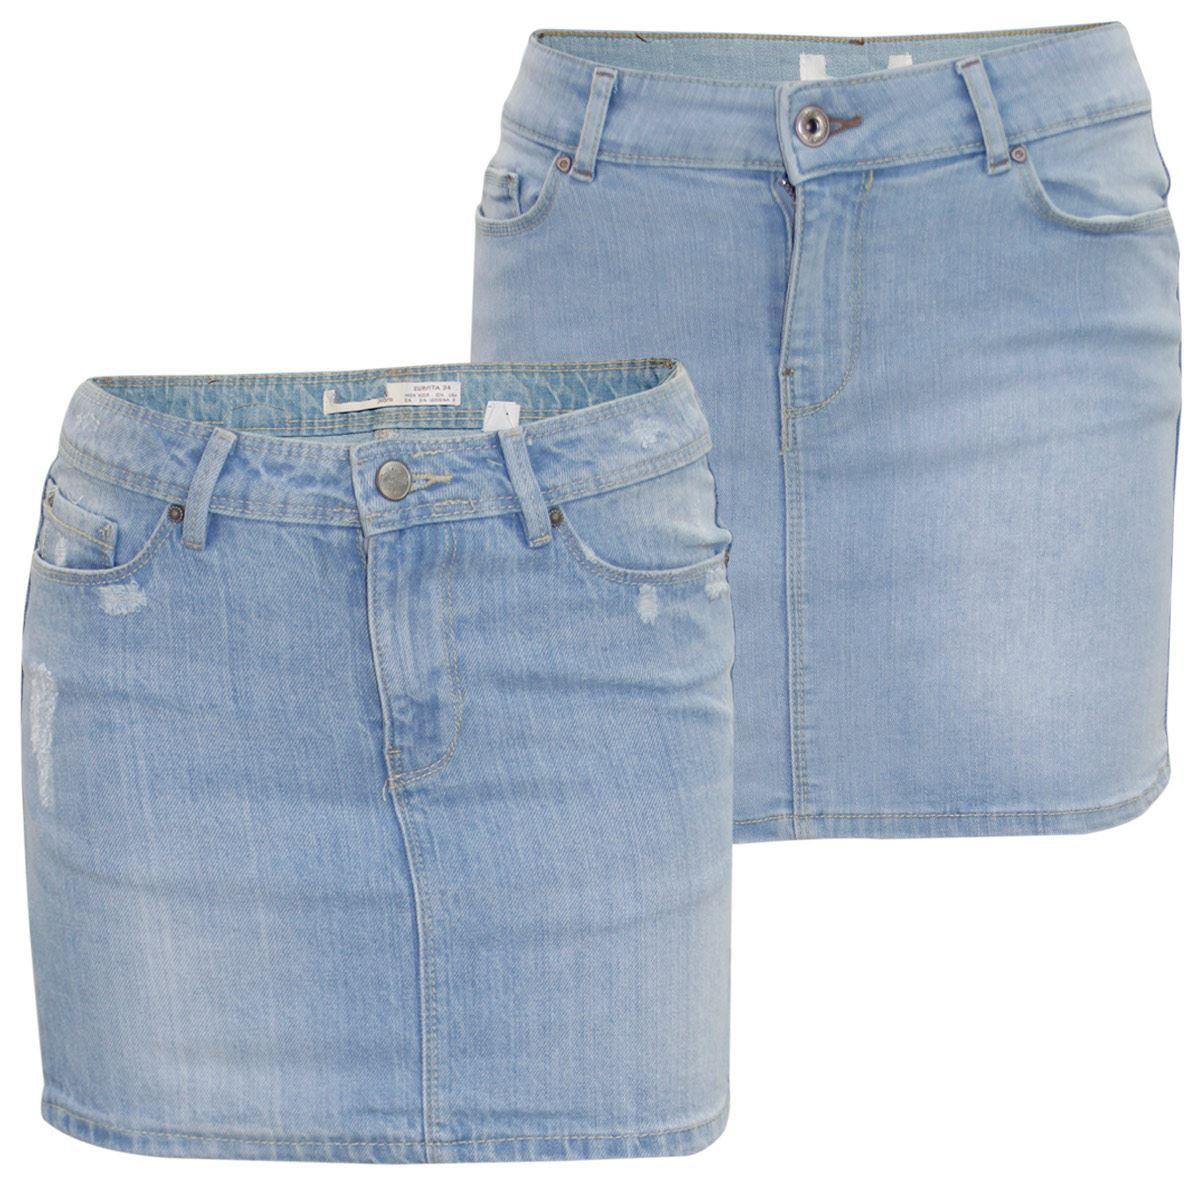 neu damen stretch denim shorts minirock womens sommer. Black Bedroom Furniture Sets. Home Design Ideas